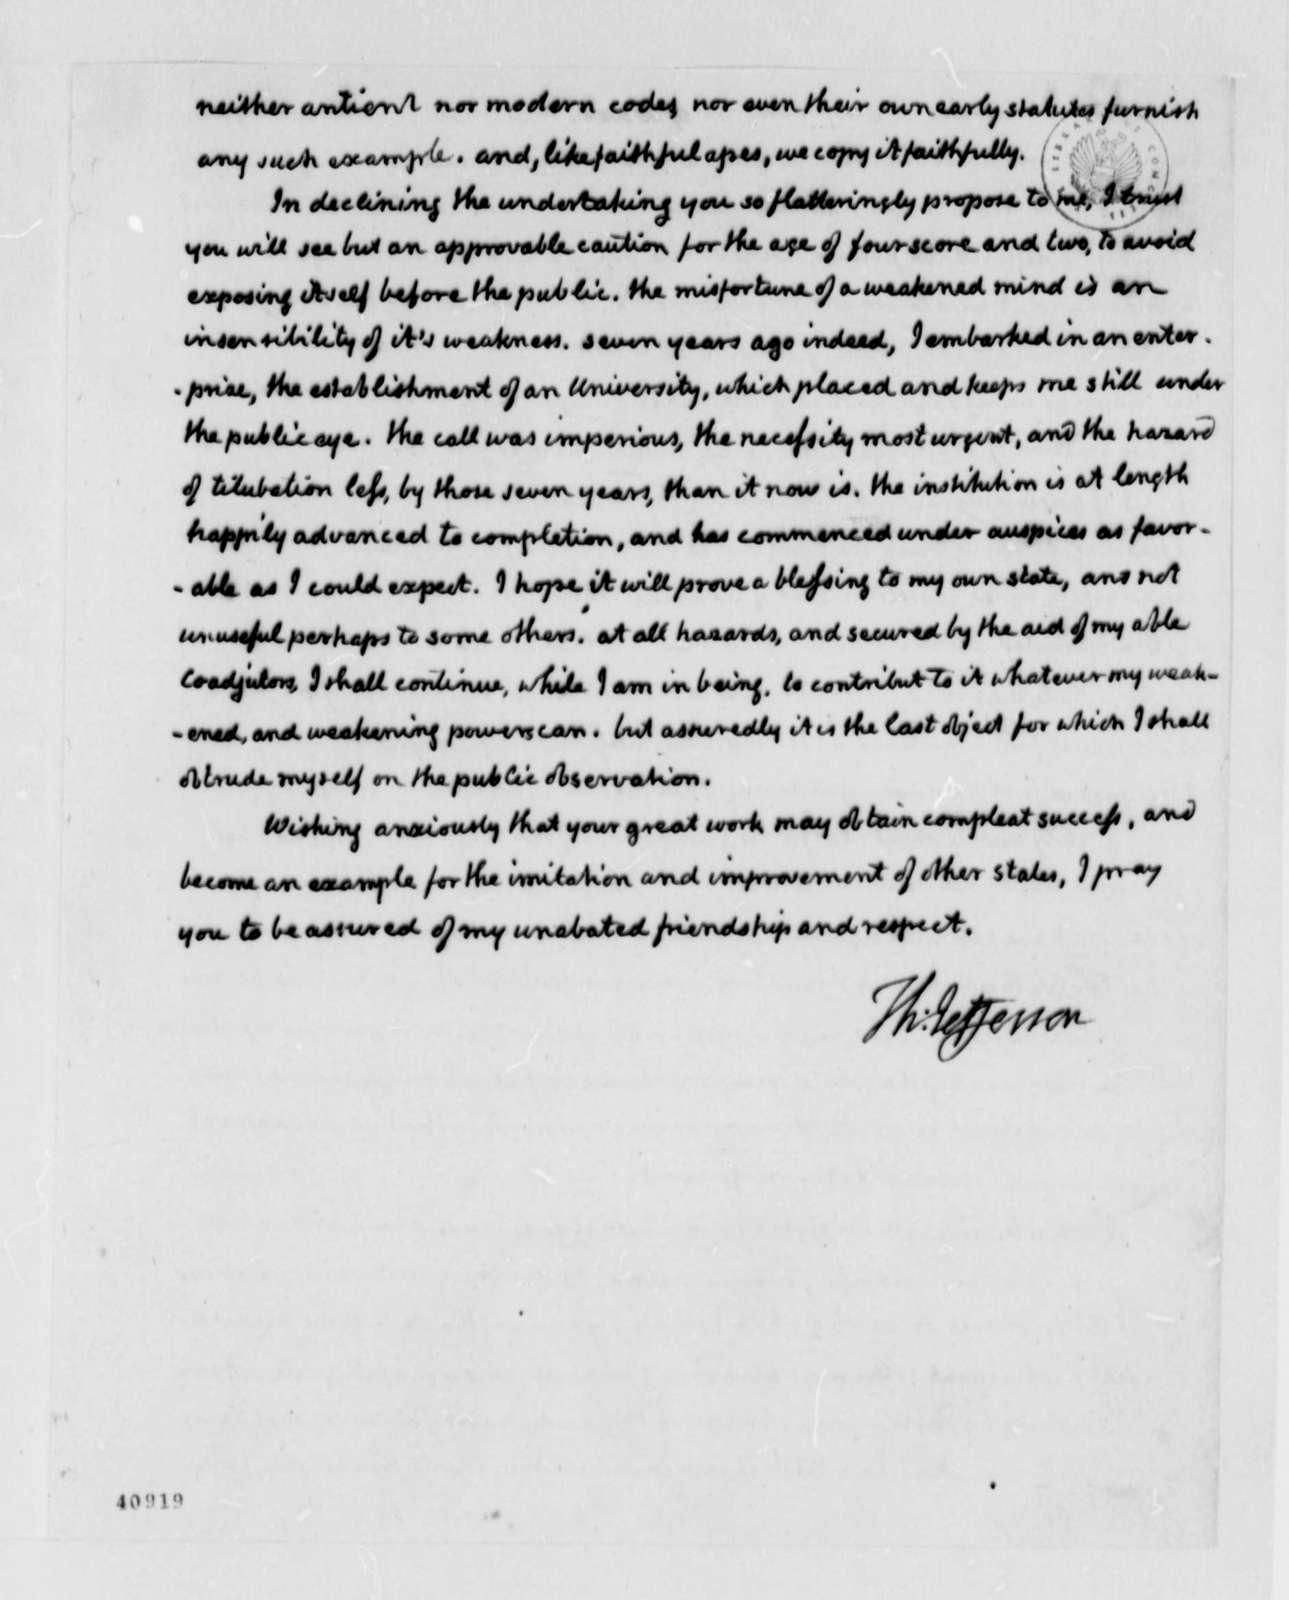 Thomas Jefferson to Edward Livingston, March 25, 1825